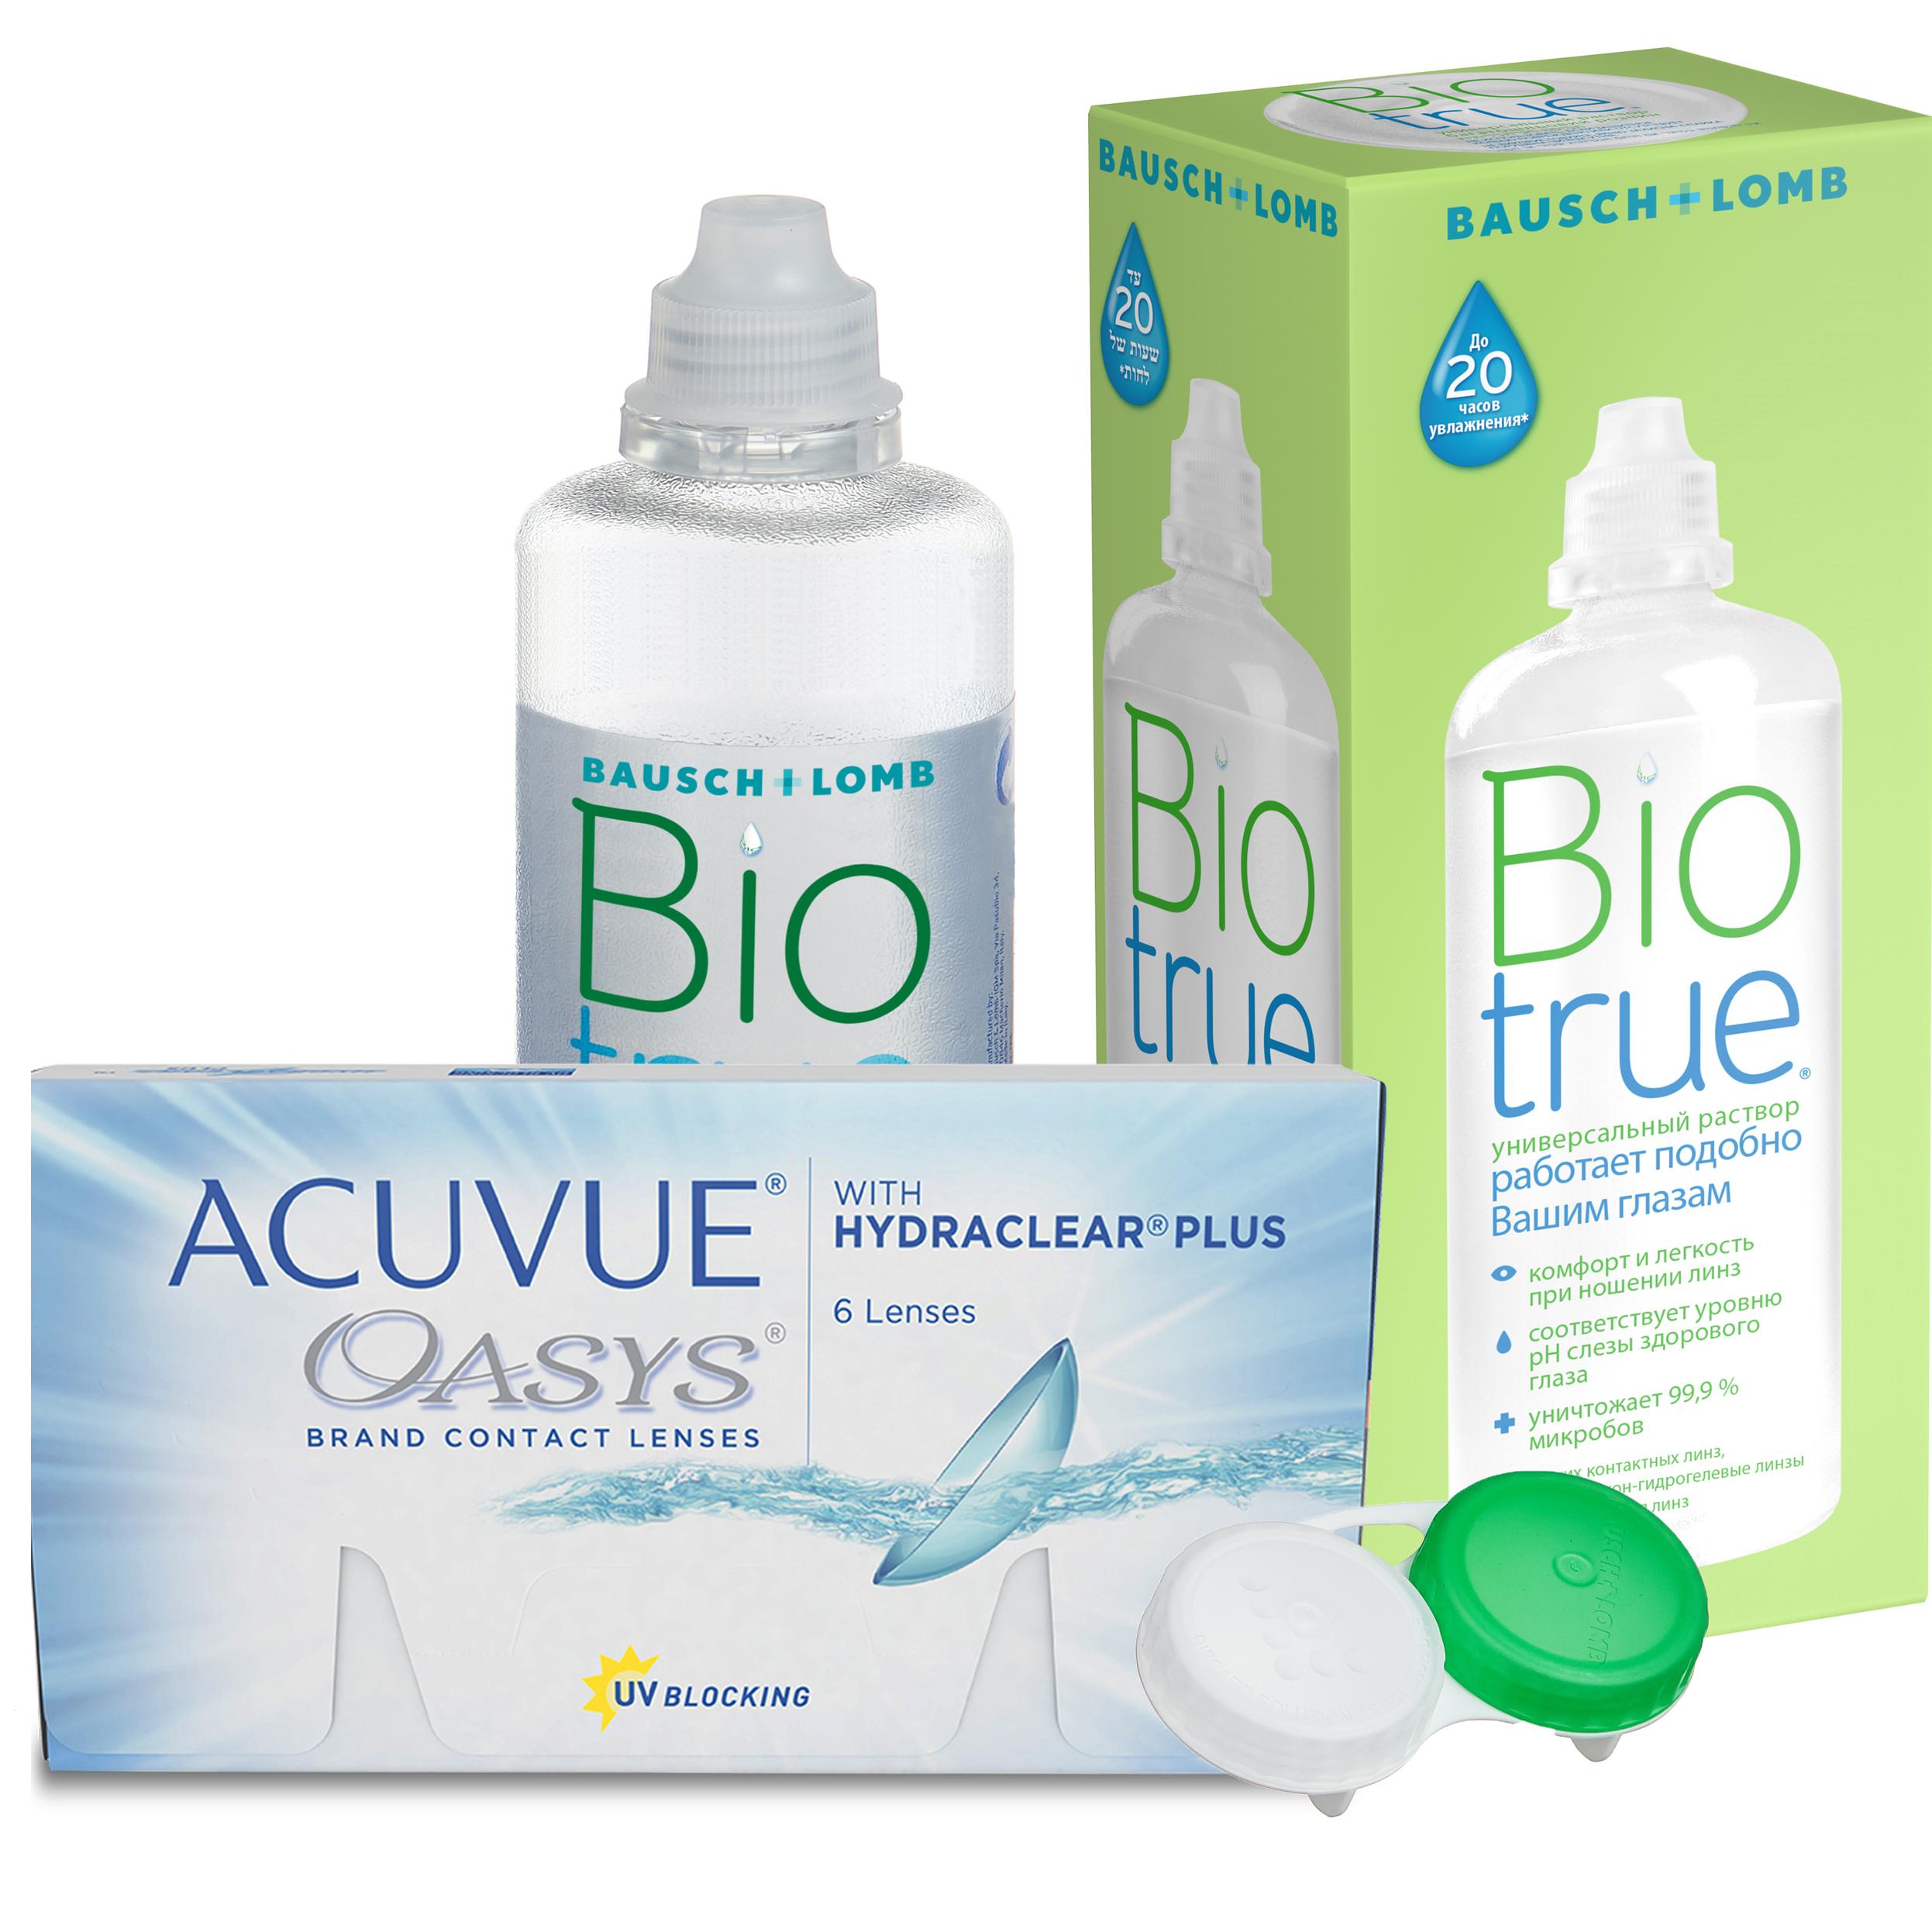 Купить Oasys with Hydraclear Plus 6 линз + Biotrue, Контактные линзы Acuvue Oasys with Hydraclear Plus 6 линз R 8.8 -0, 25 + Biotrue 300 мл